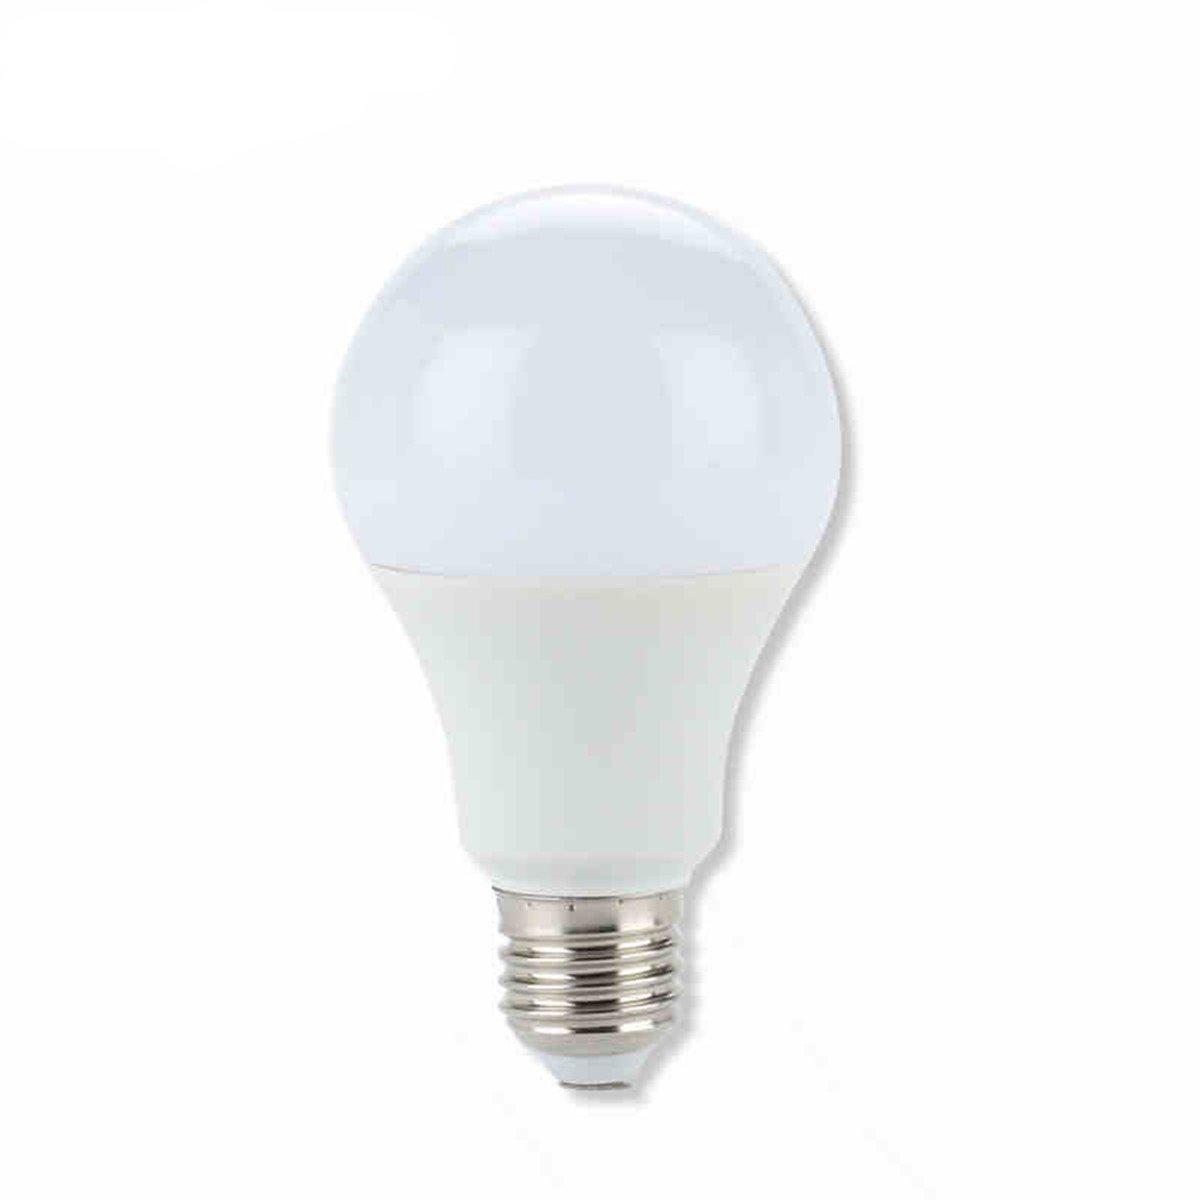 Kendal E27 LED radar Motion Detection Light Sensor Pir Light Bulb Lamp Auto Switch Stairs Night Light Detection Range 24-36 feet (9 Watts) by Kendal (Image #2)